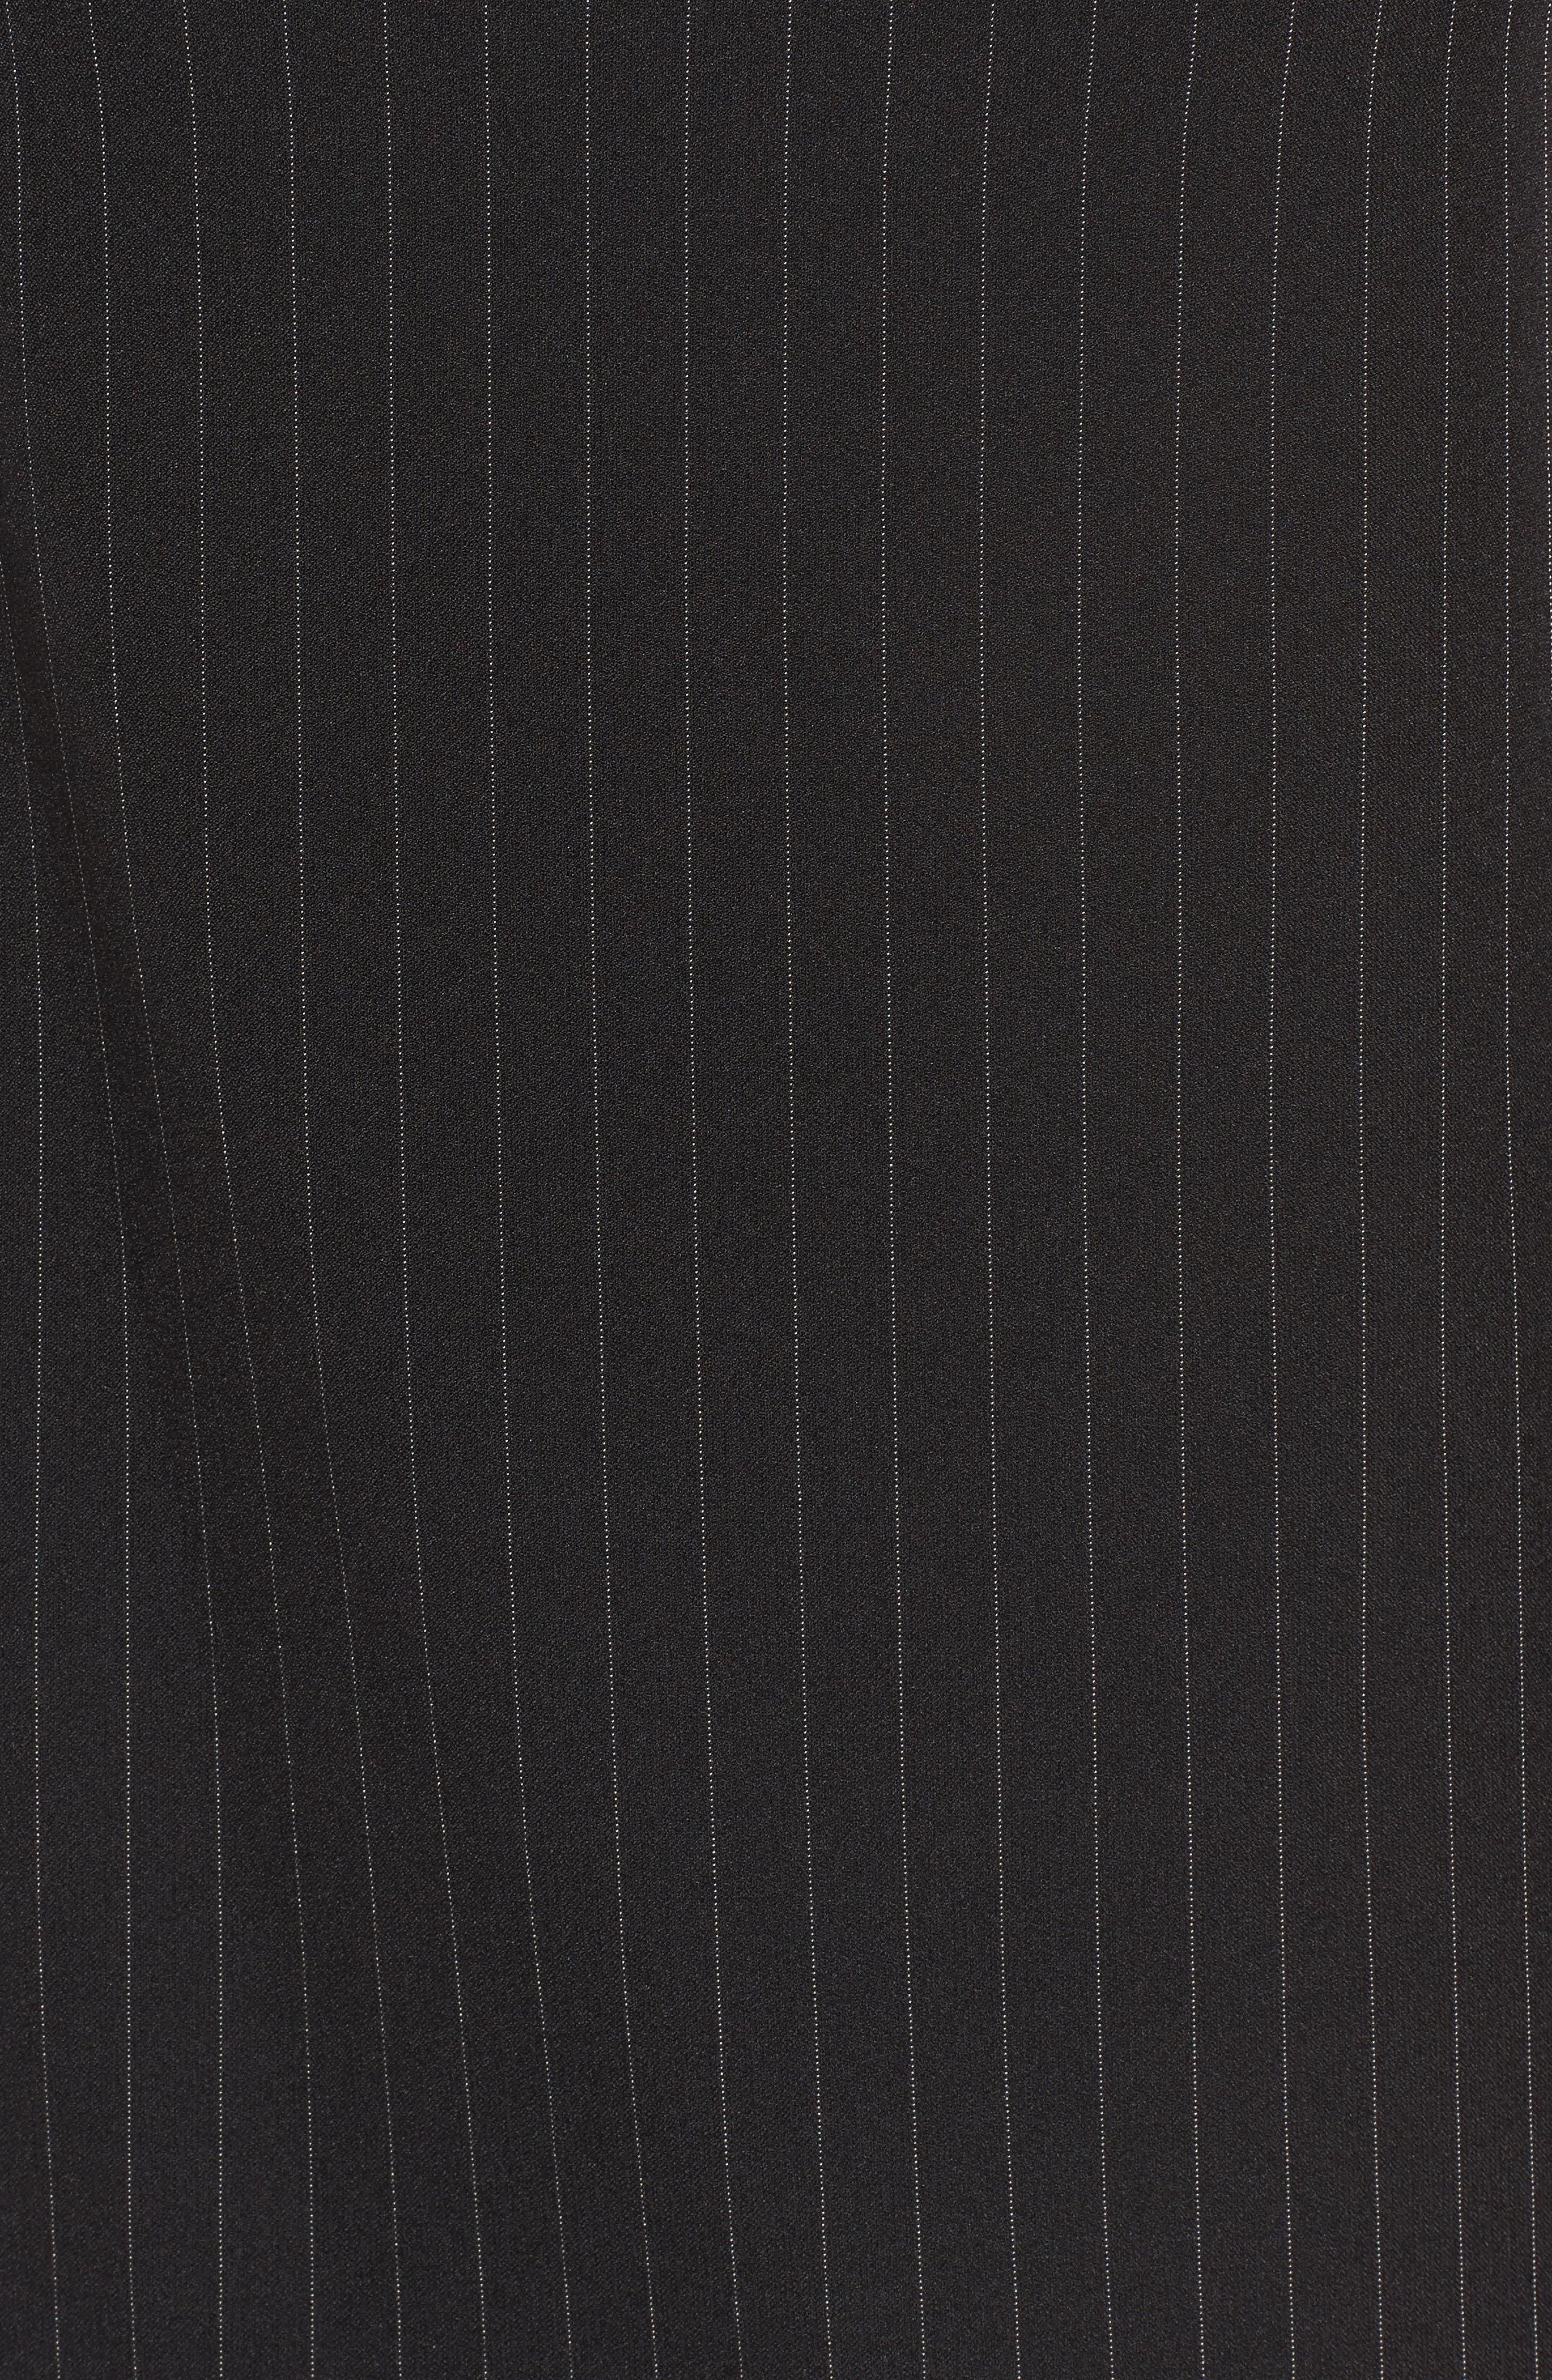 Pinstripe Shift Dress,                             Alternate thumbnail 5, color,                             Black/ White